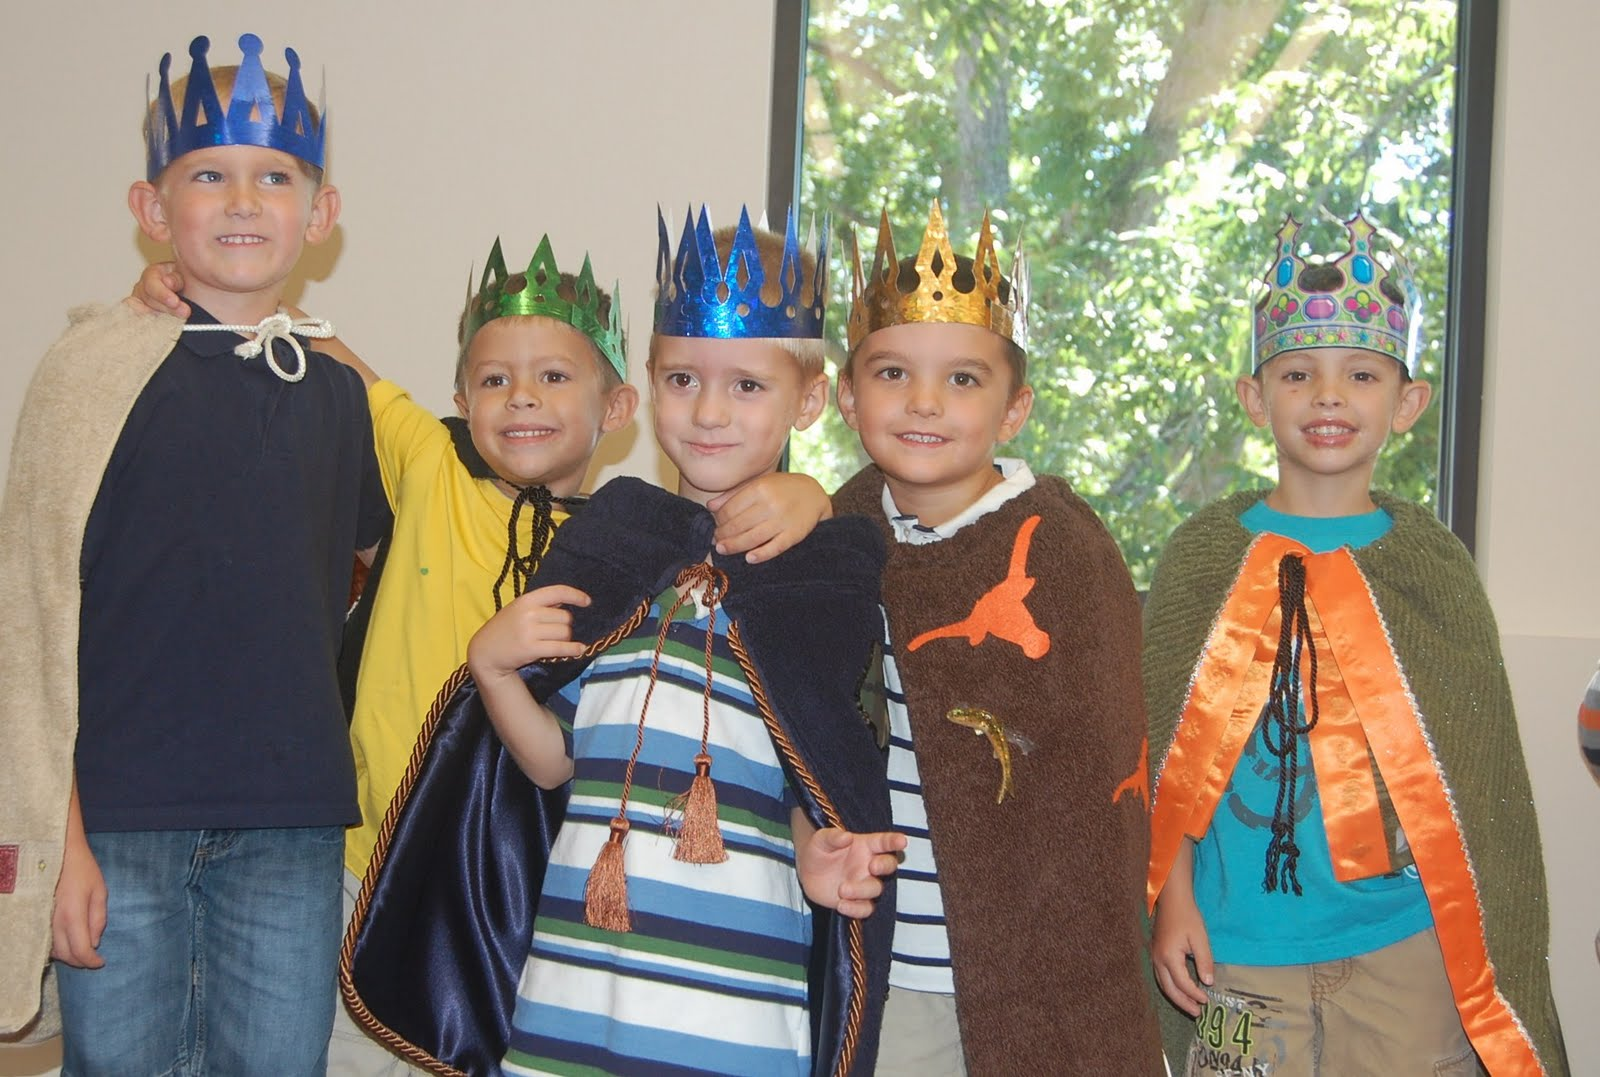 Maurer Party Of Five Kindergarten Royalty